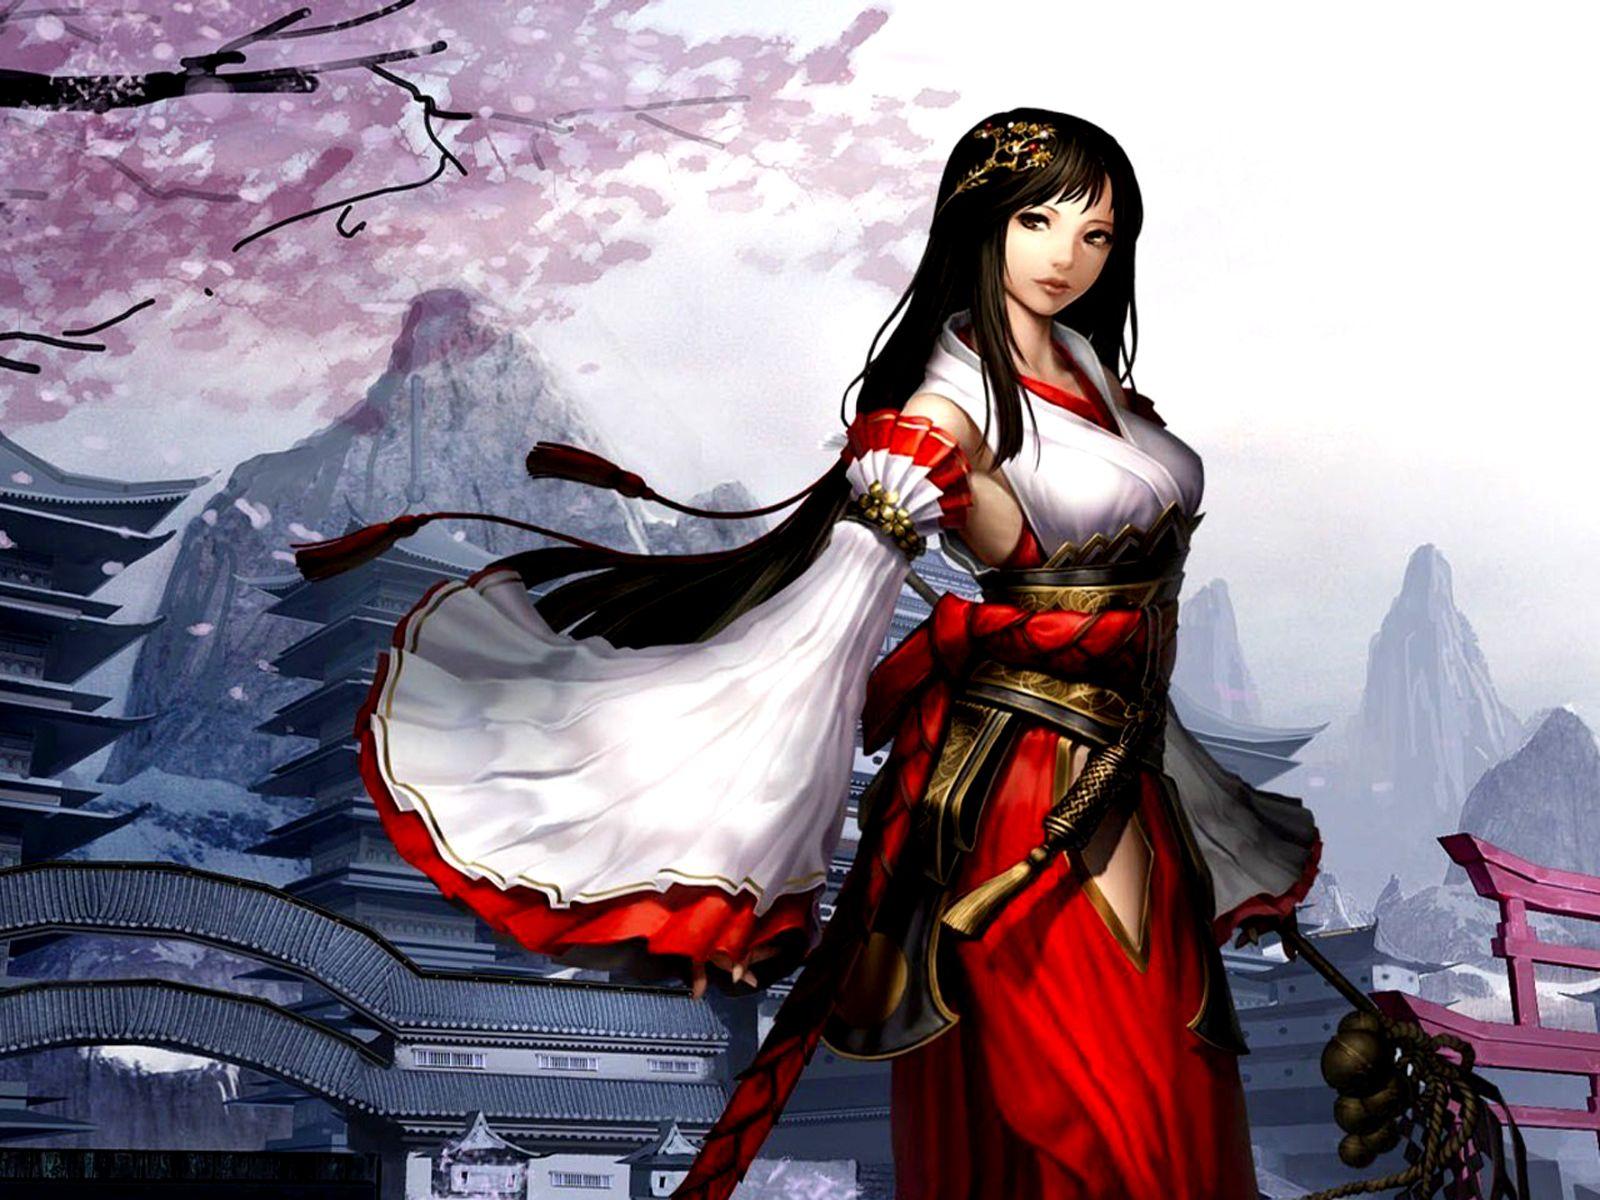 Anime Chinese Warrior Anime Warrior Anime Asian Beautiful